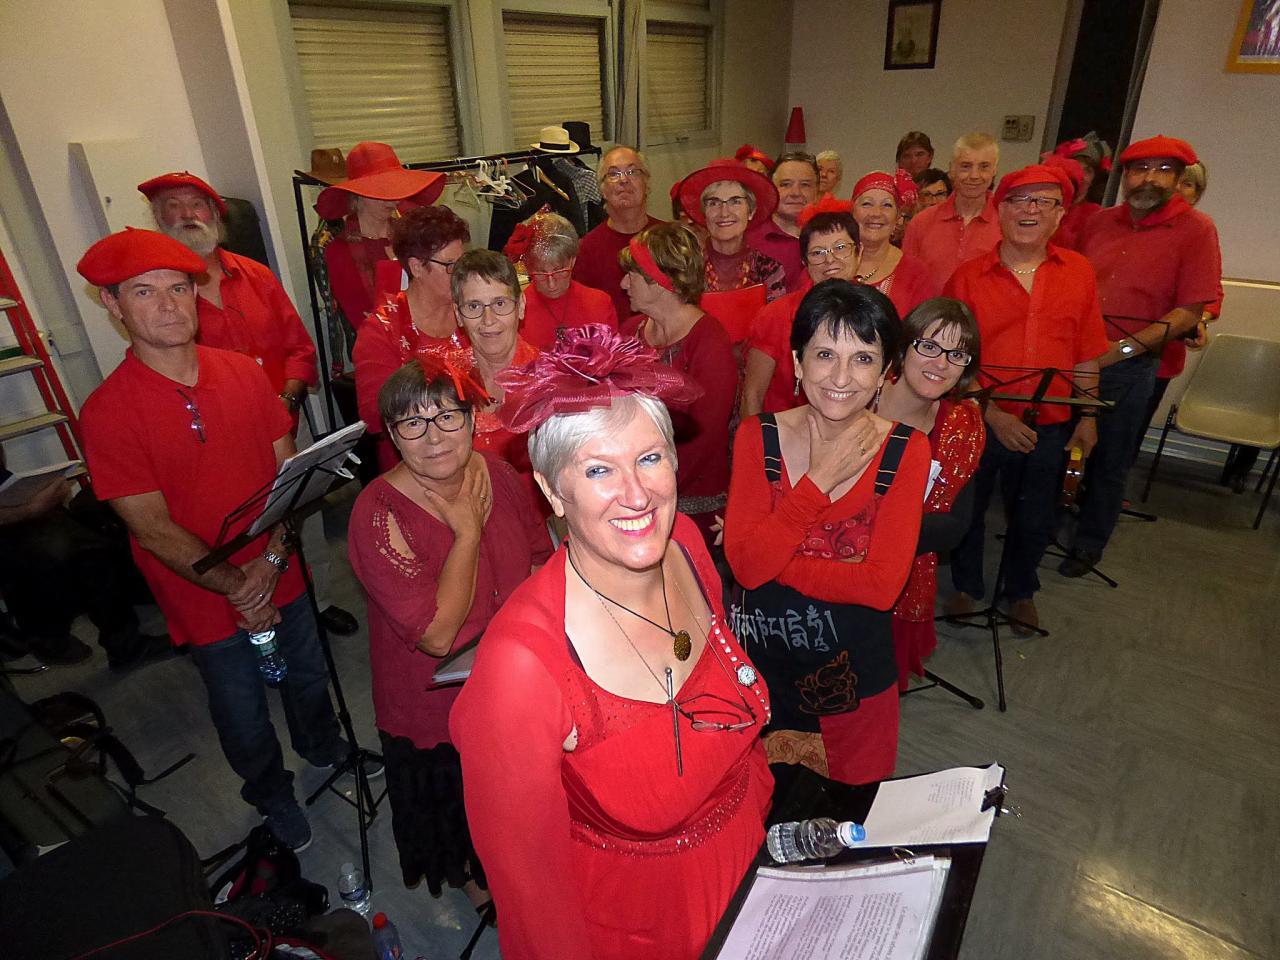 Festin Choral Gaperons Rouges-004